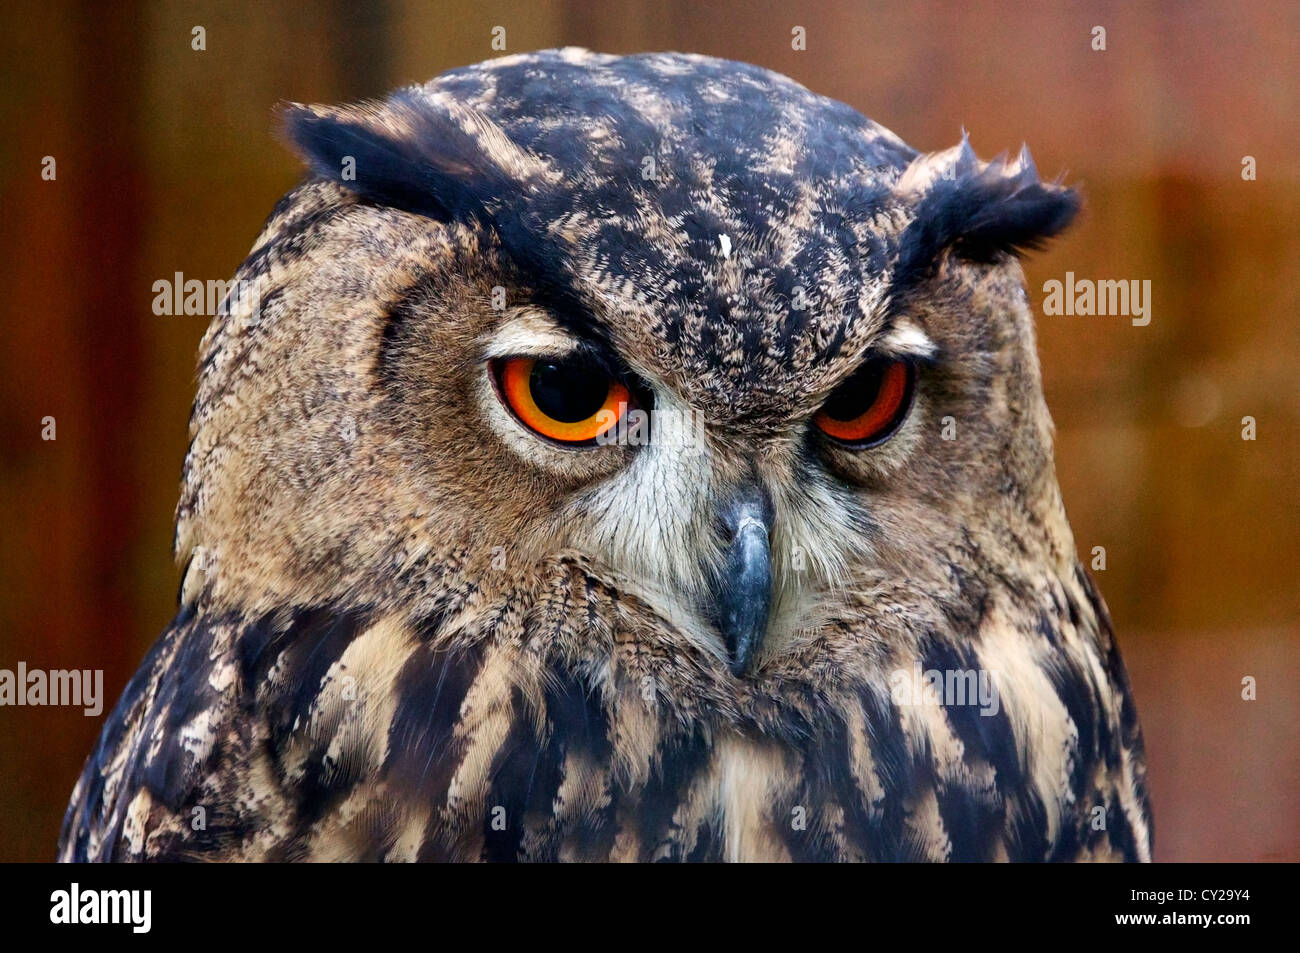 Closeup of an Owls head - Stock Image